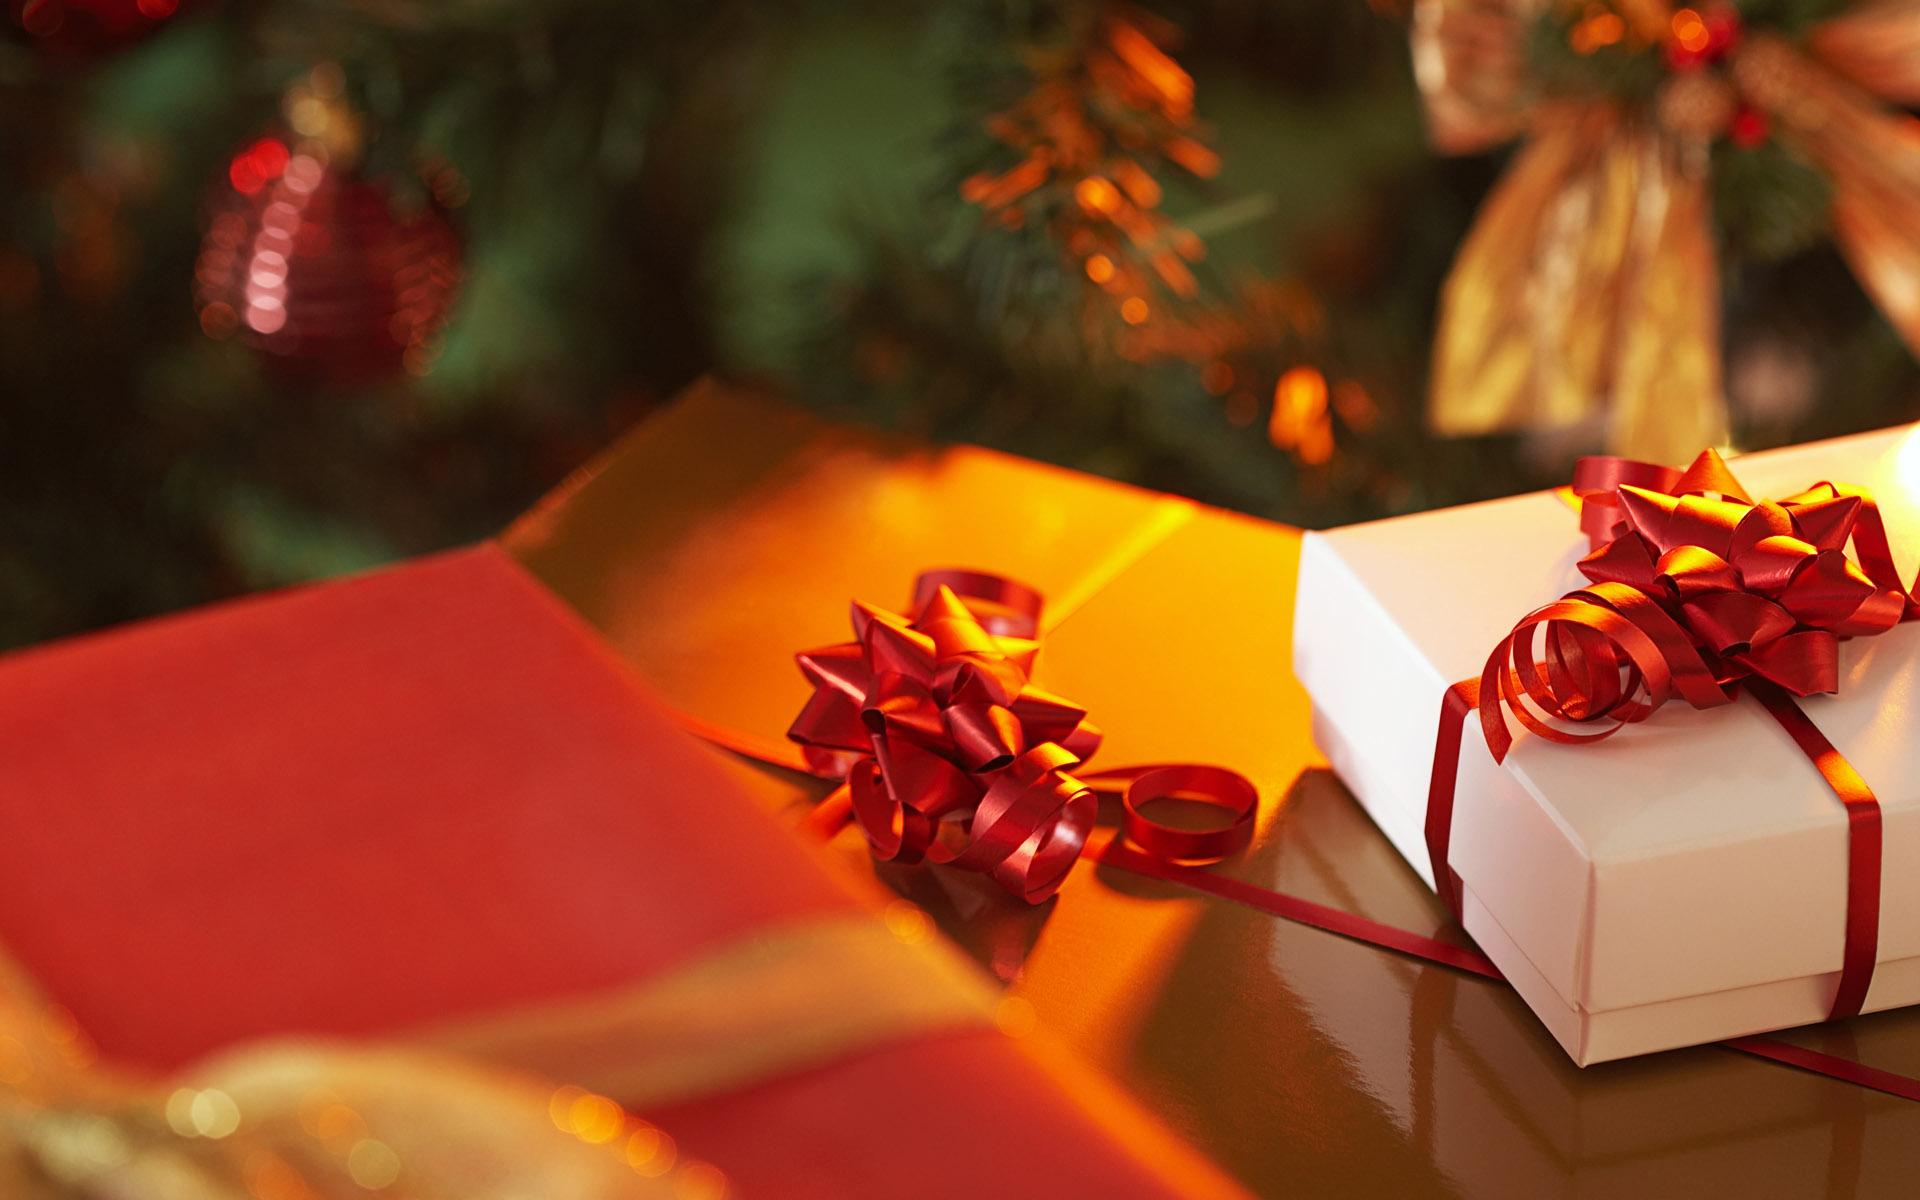 High Street Gent - Christmas Presents under Christmas Tree